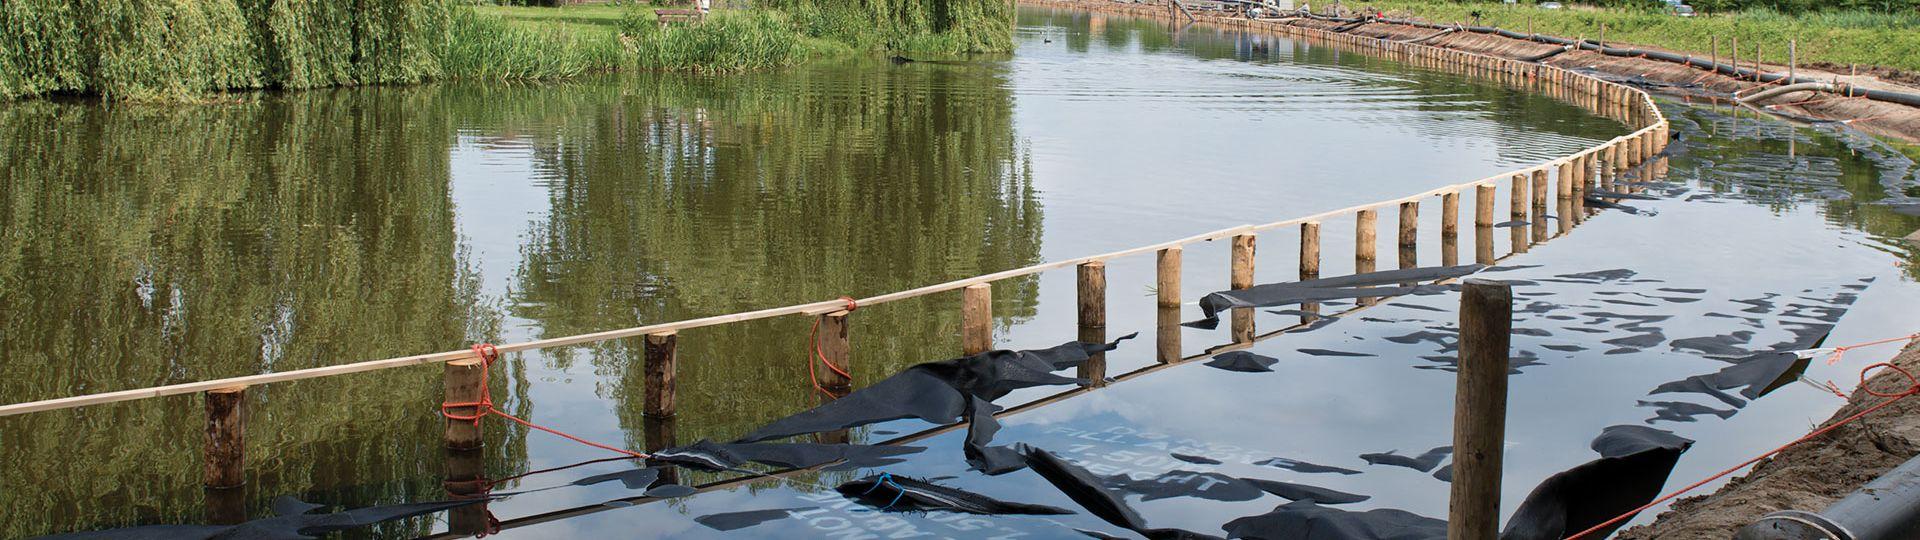 Baleen Rapid Dewatering System Borculo.